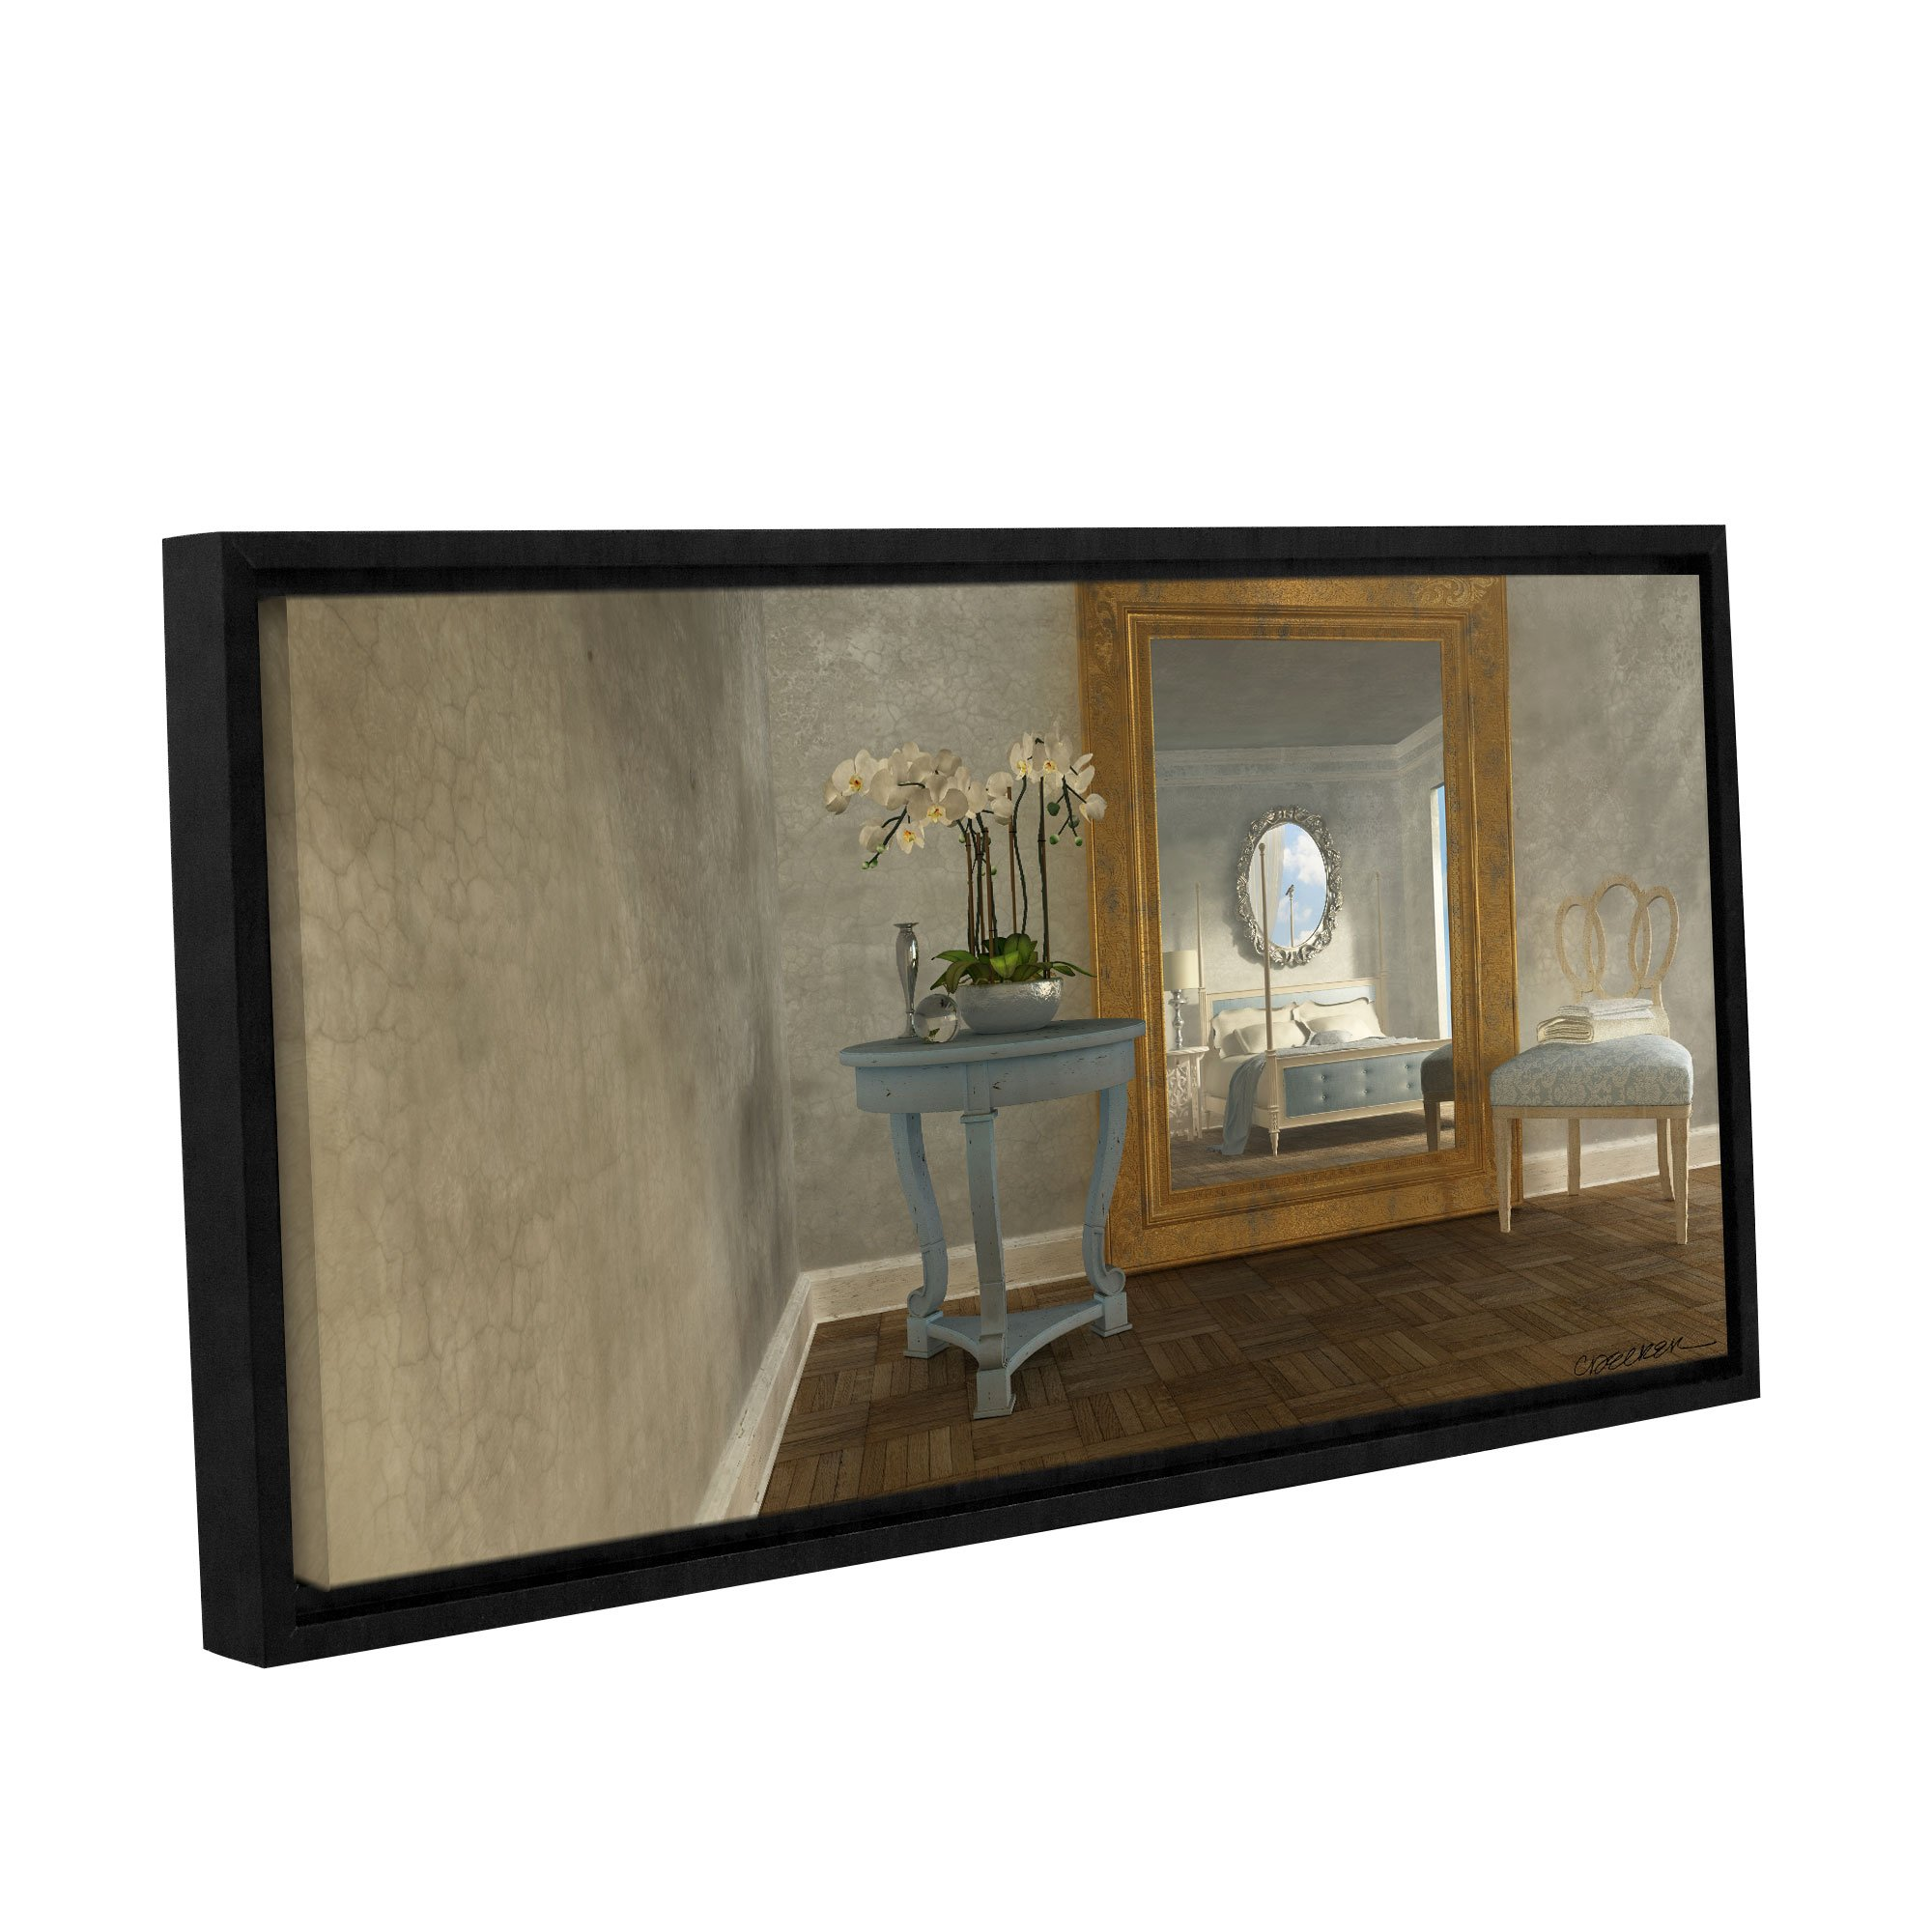 ArtWall 0dec024a2448f Cynthia Decker's Reflection, Gallery-Wrapped Floater-Framed Canvas, 24-Inch x 48-Inch